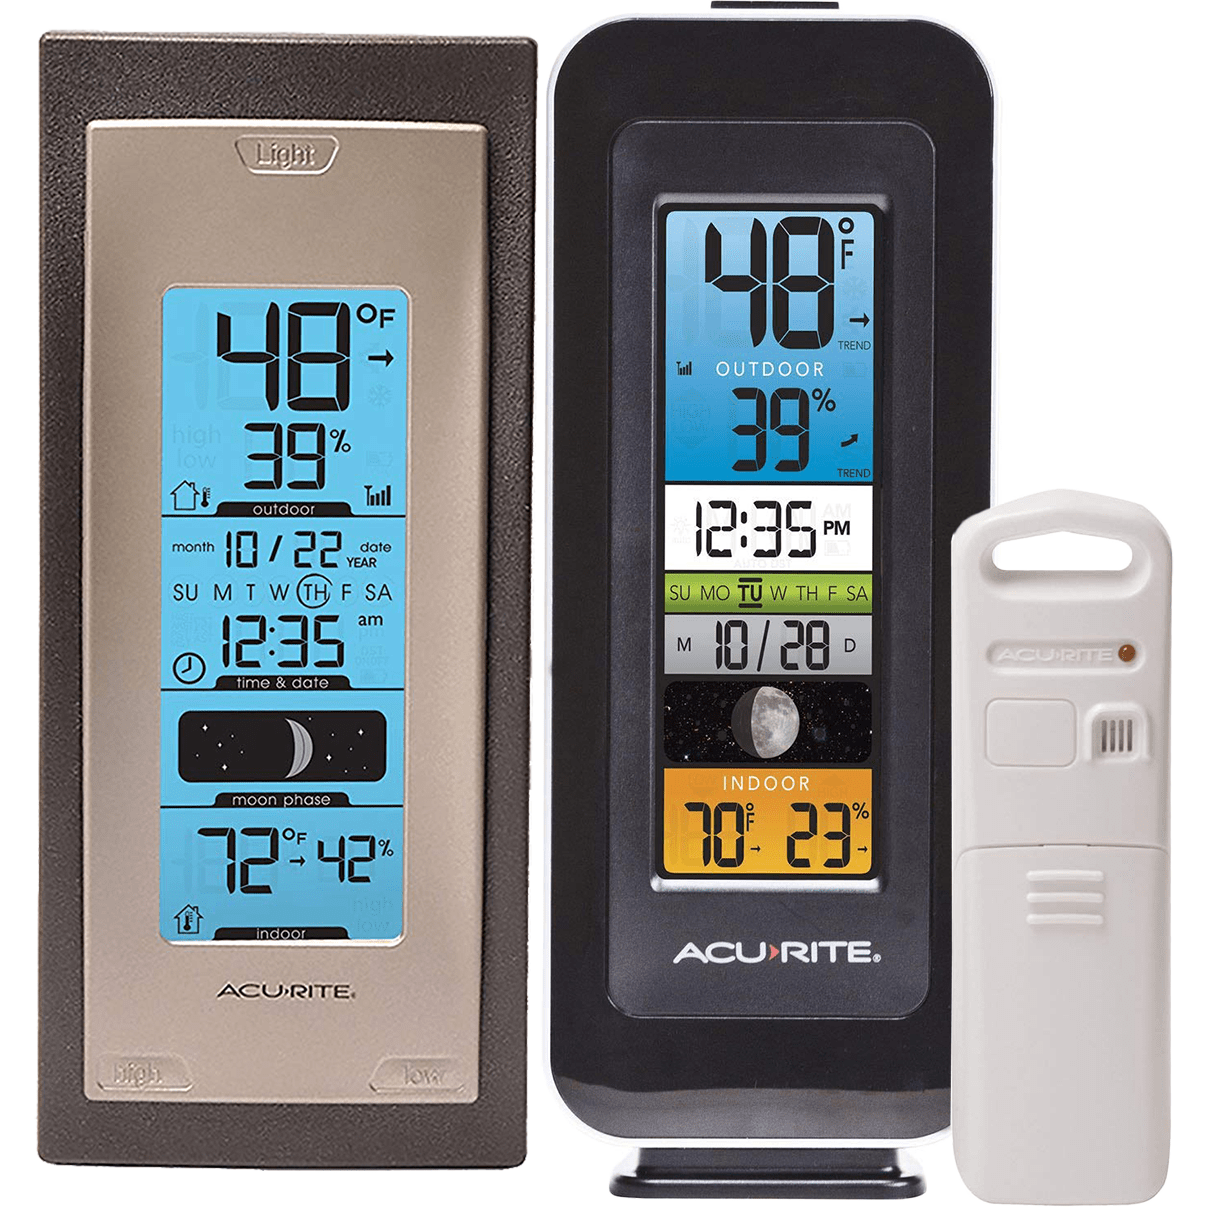 Acu-rite Remote Thermometer / Hygrometer